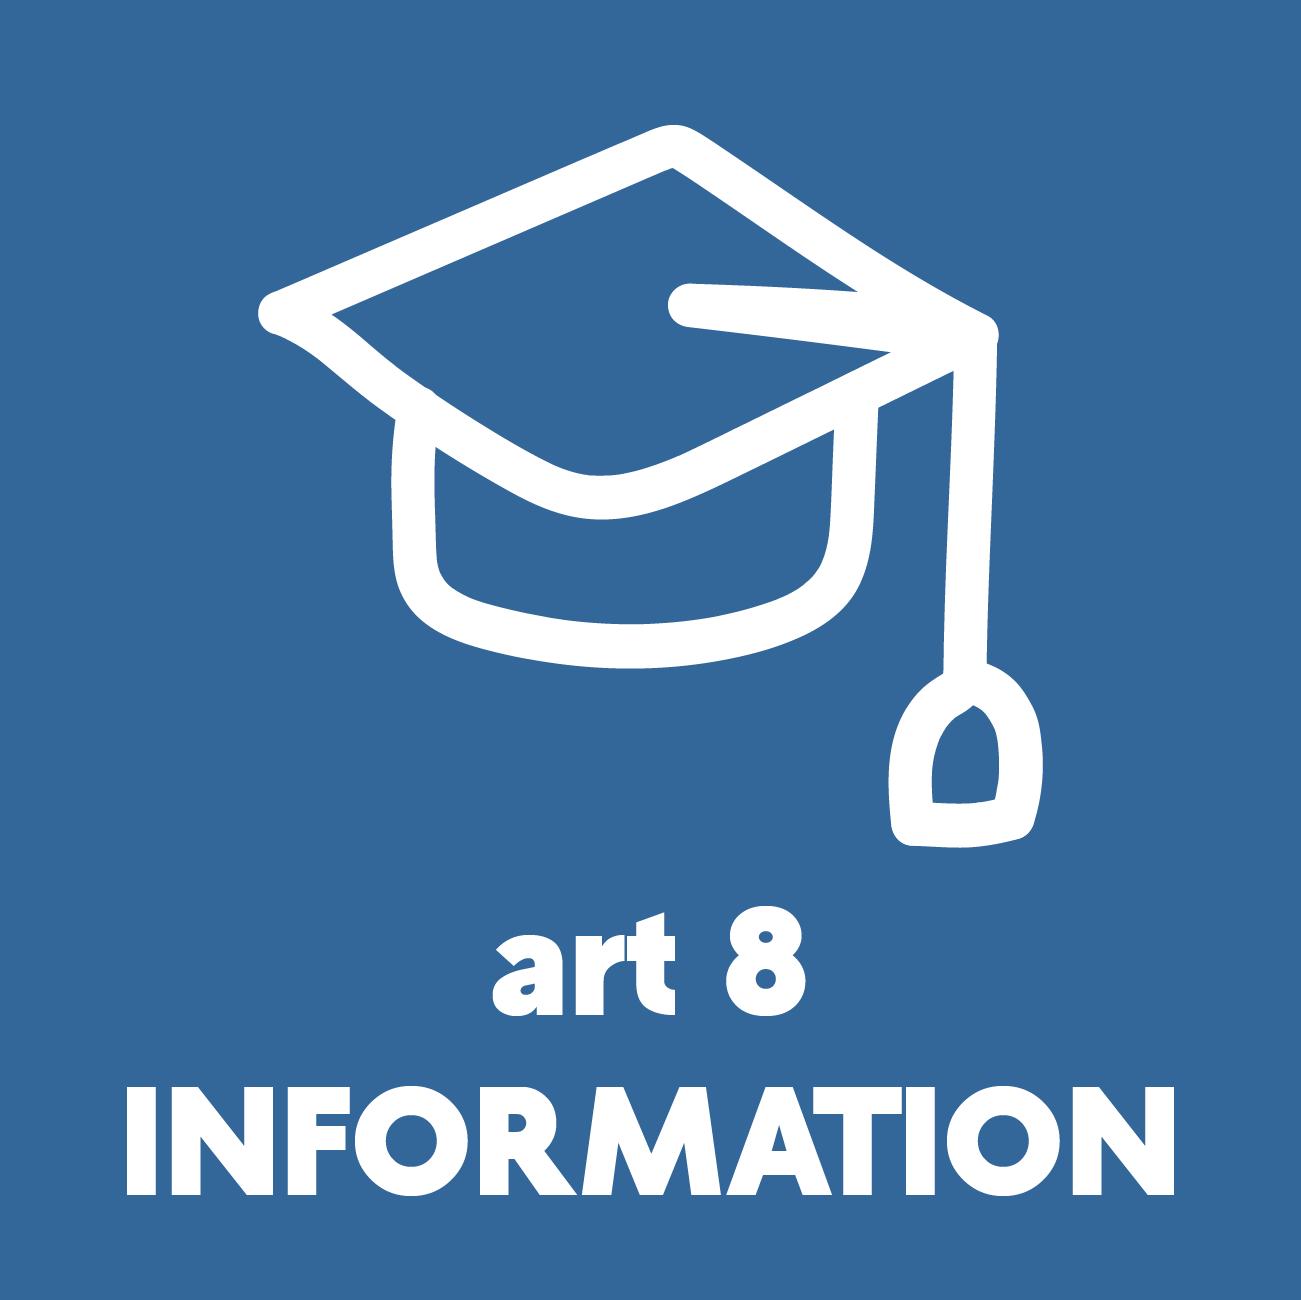 Art 08 information